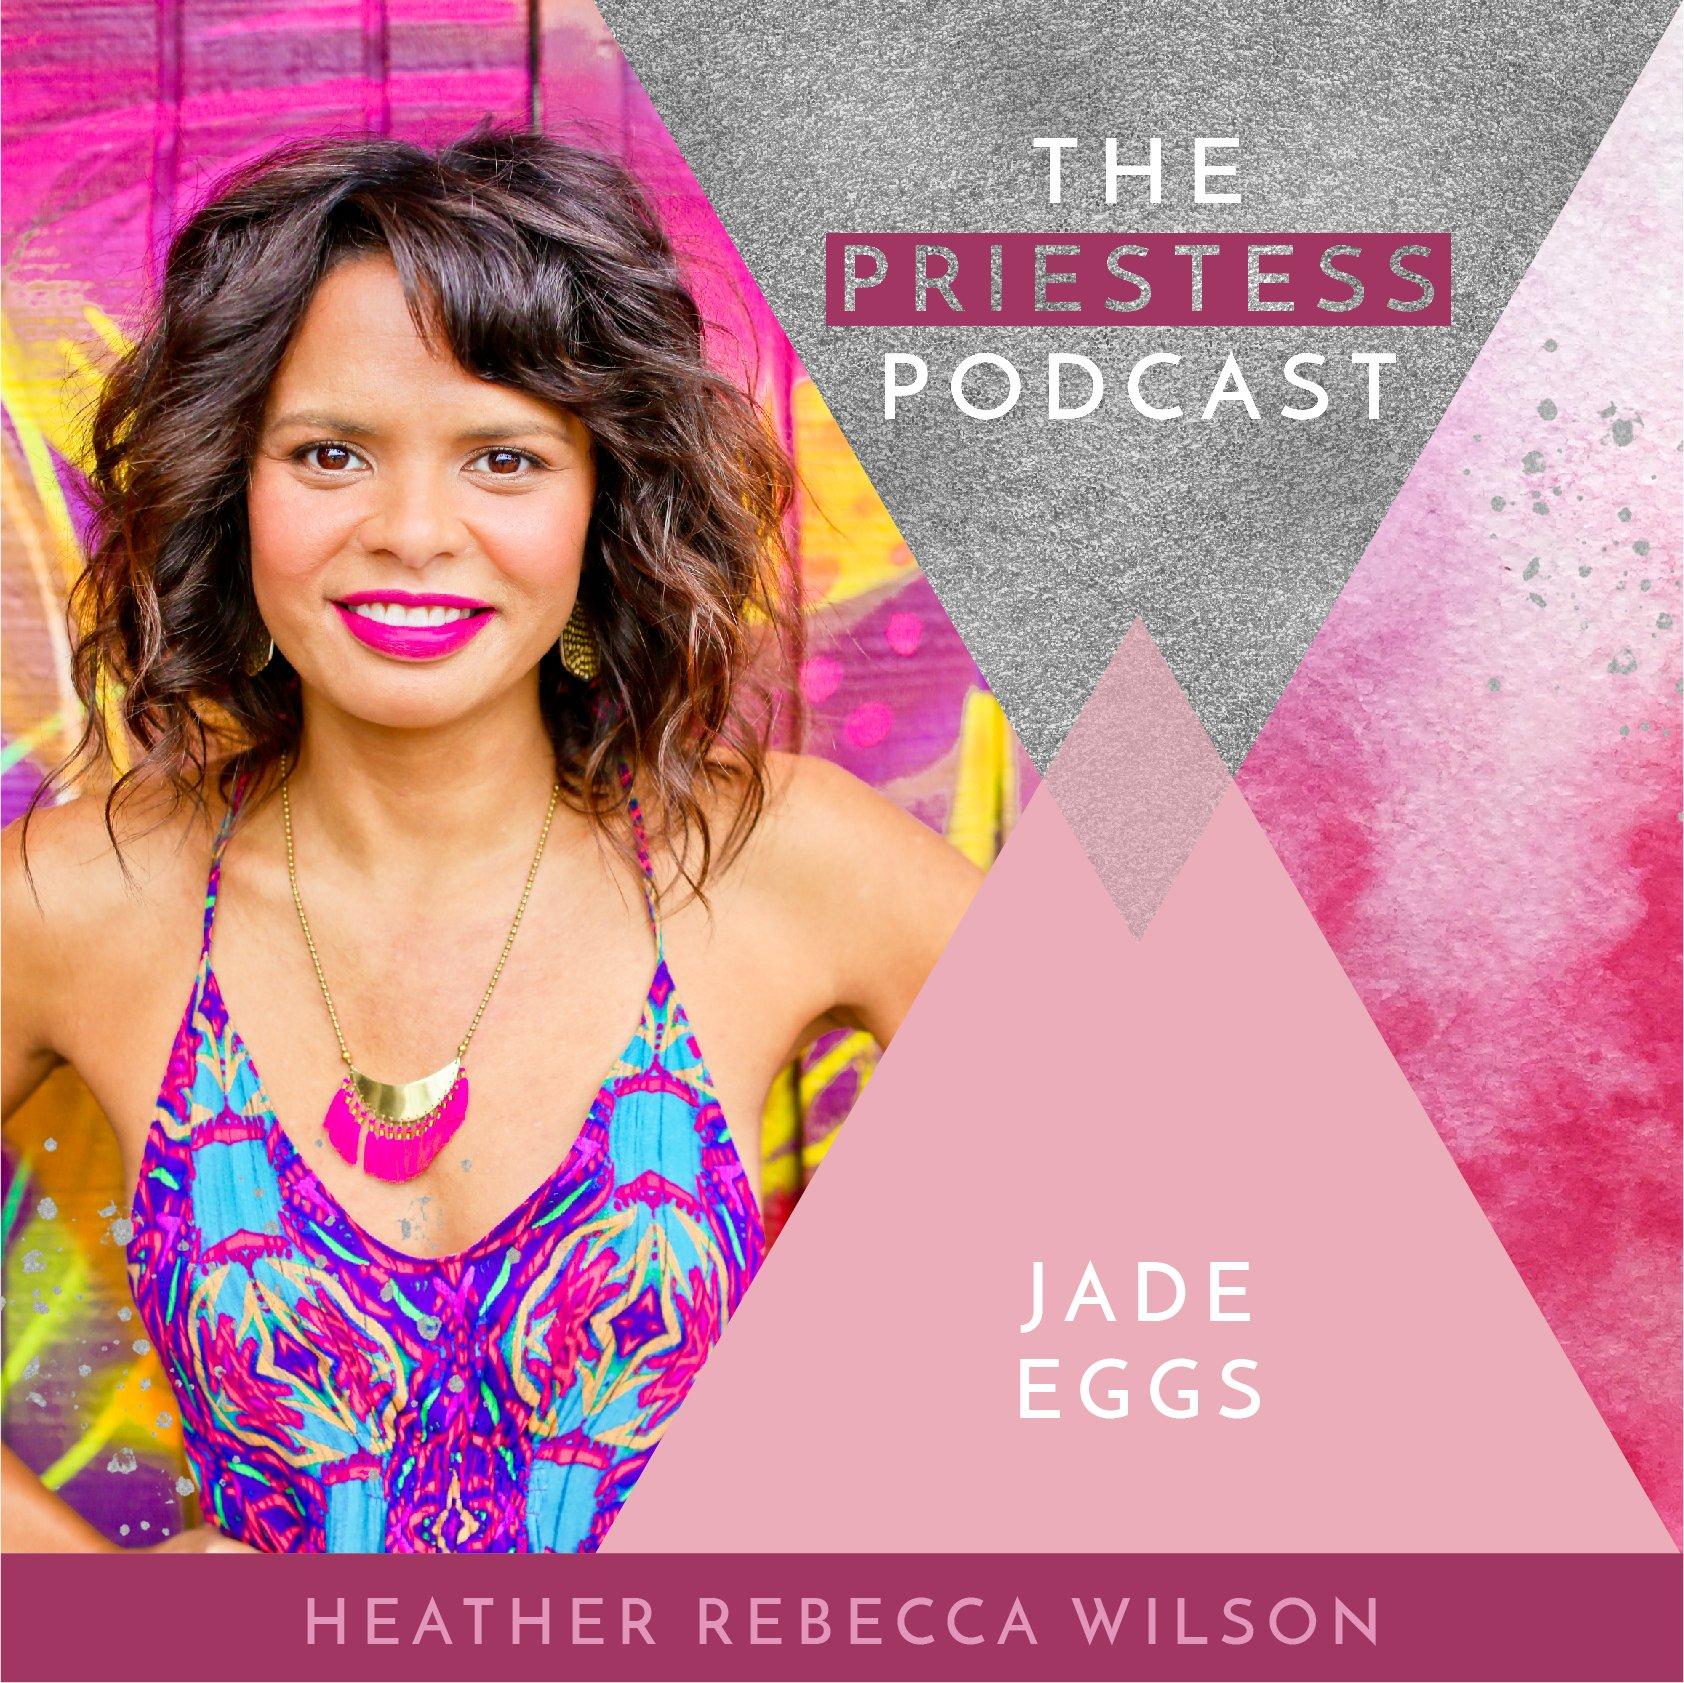 Heather Rebecca Wilson on Jade Eggs